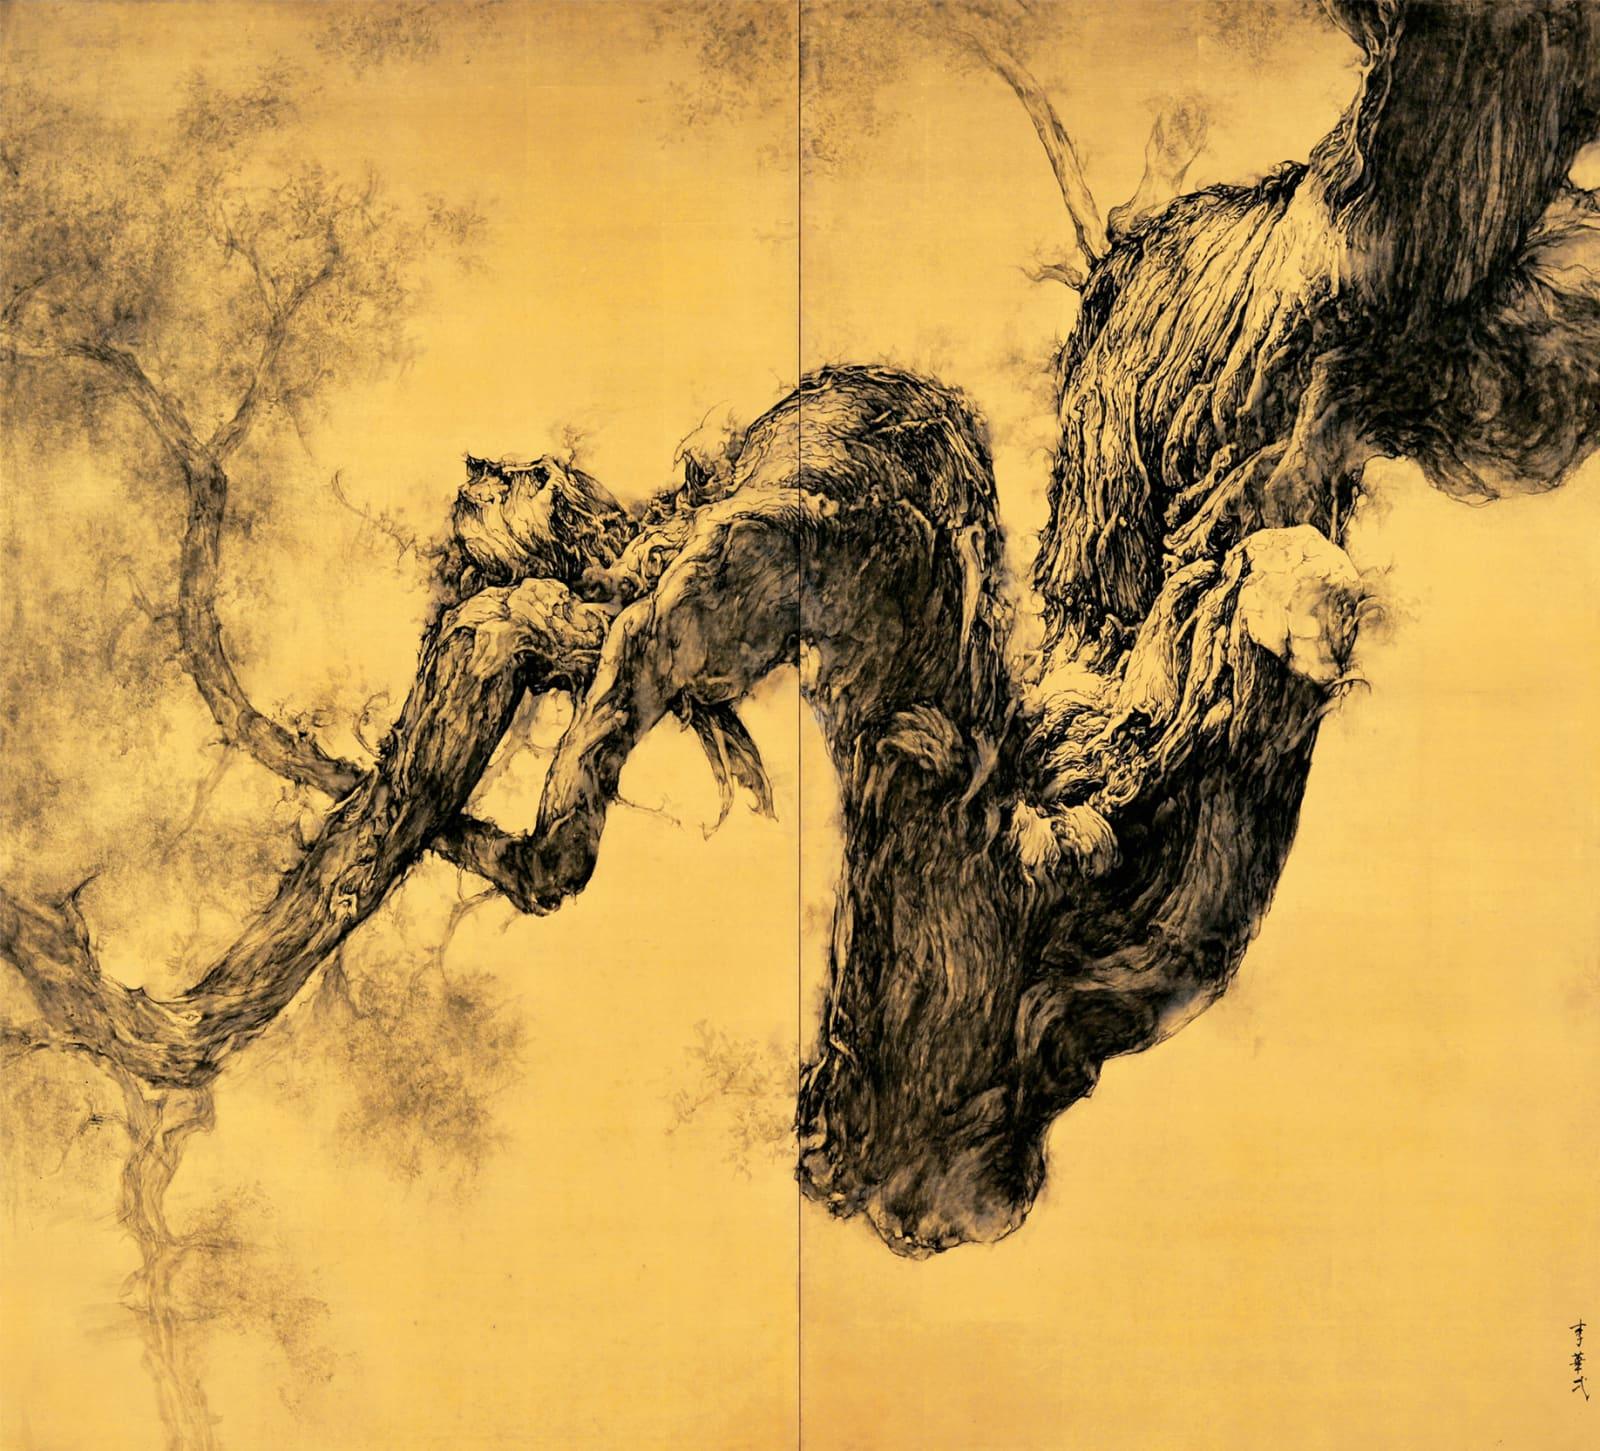 Li Huayi 李華弌, Unlimited Space, Unlimited Time 《時空無限》, 2017